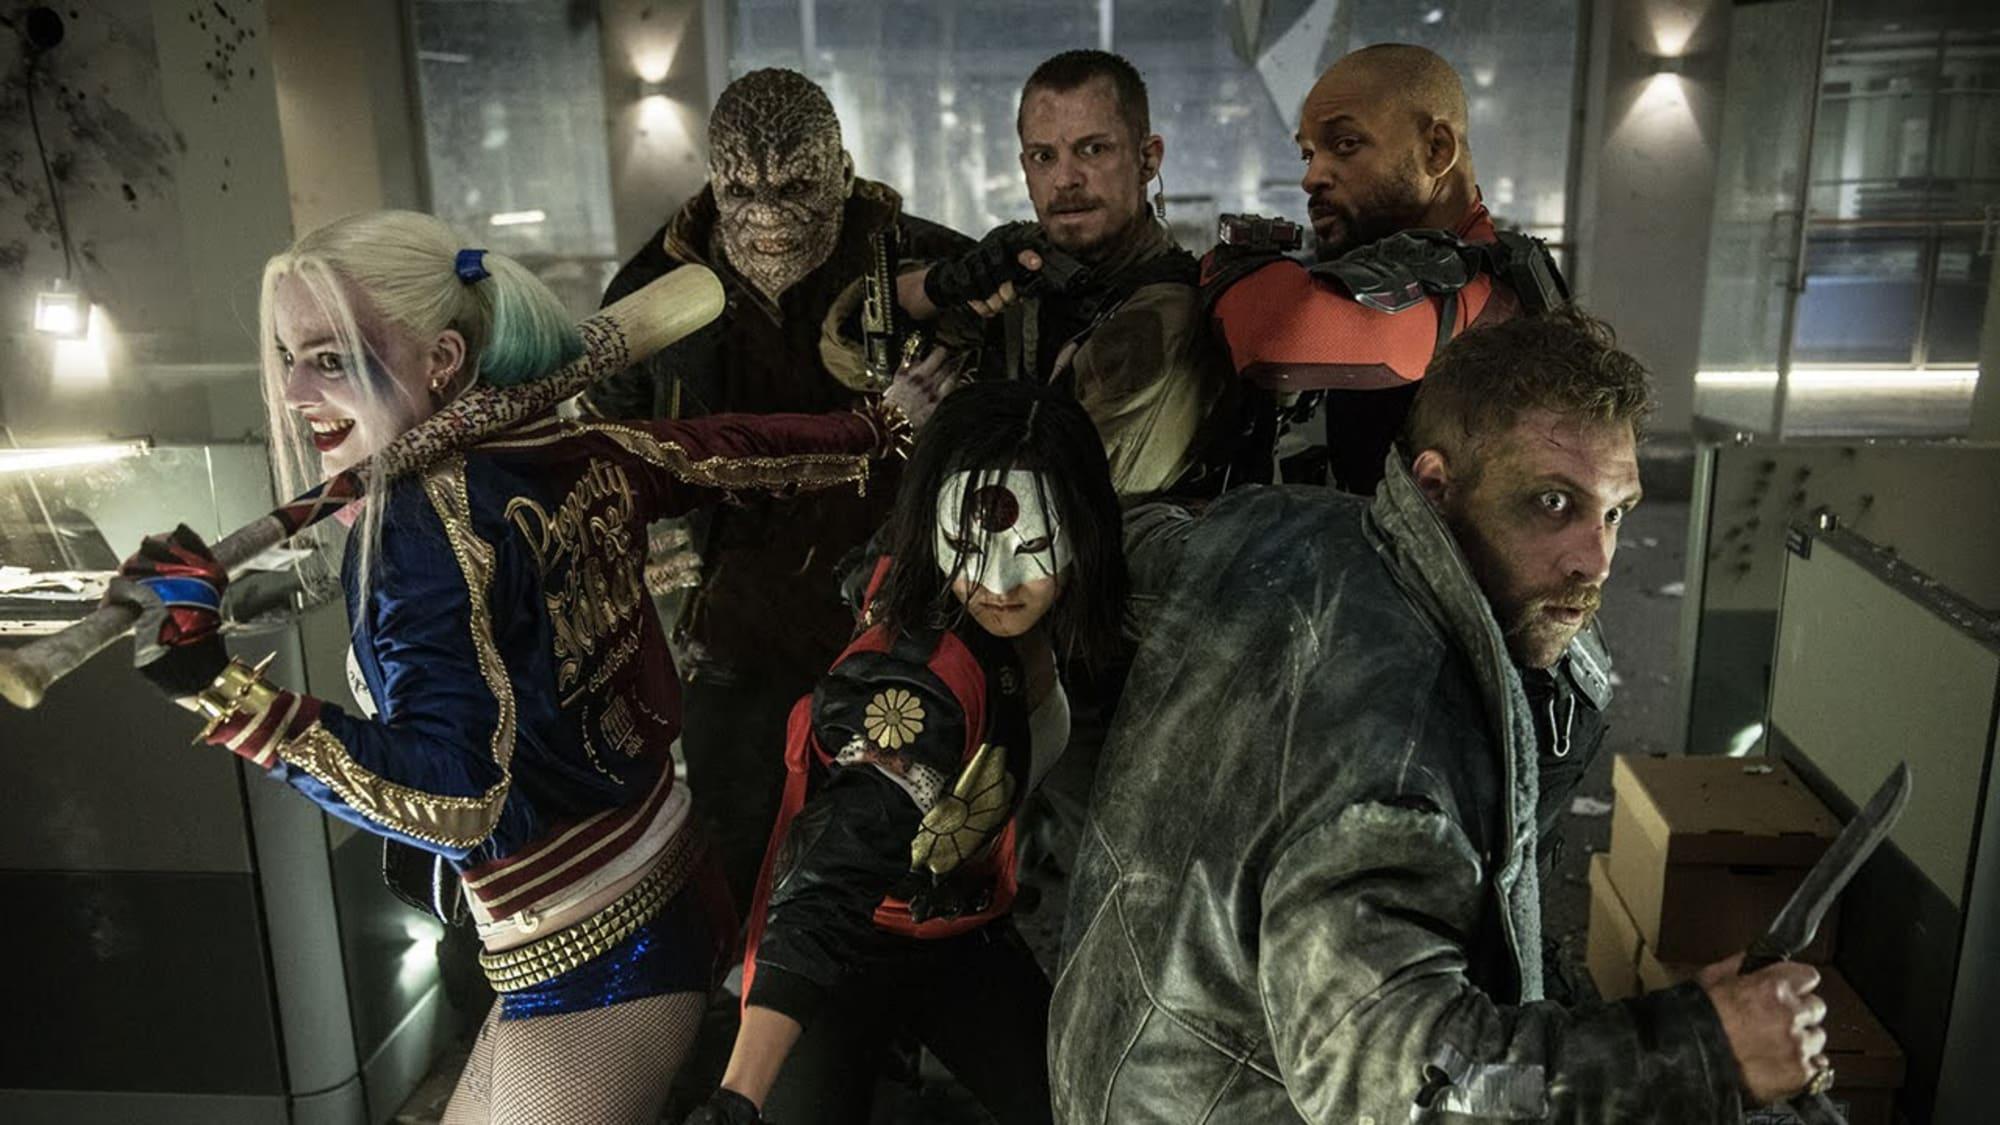 The 10 worst fight scenes in superhero movies